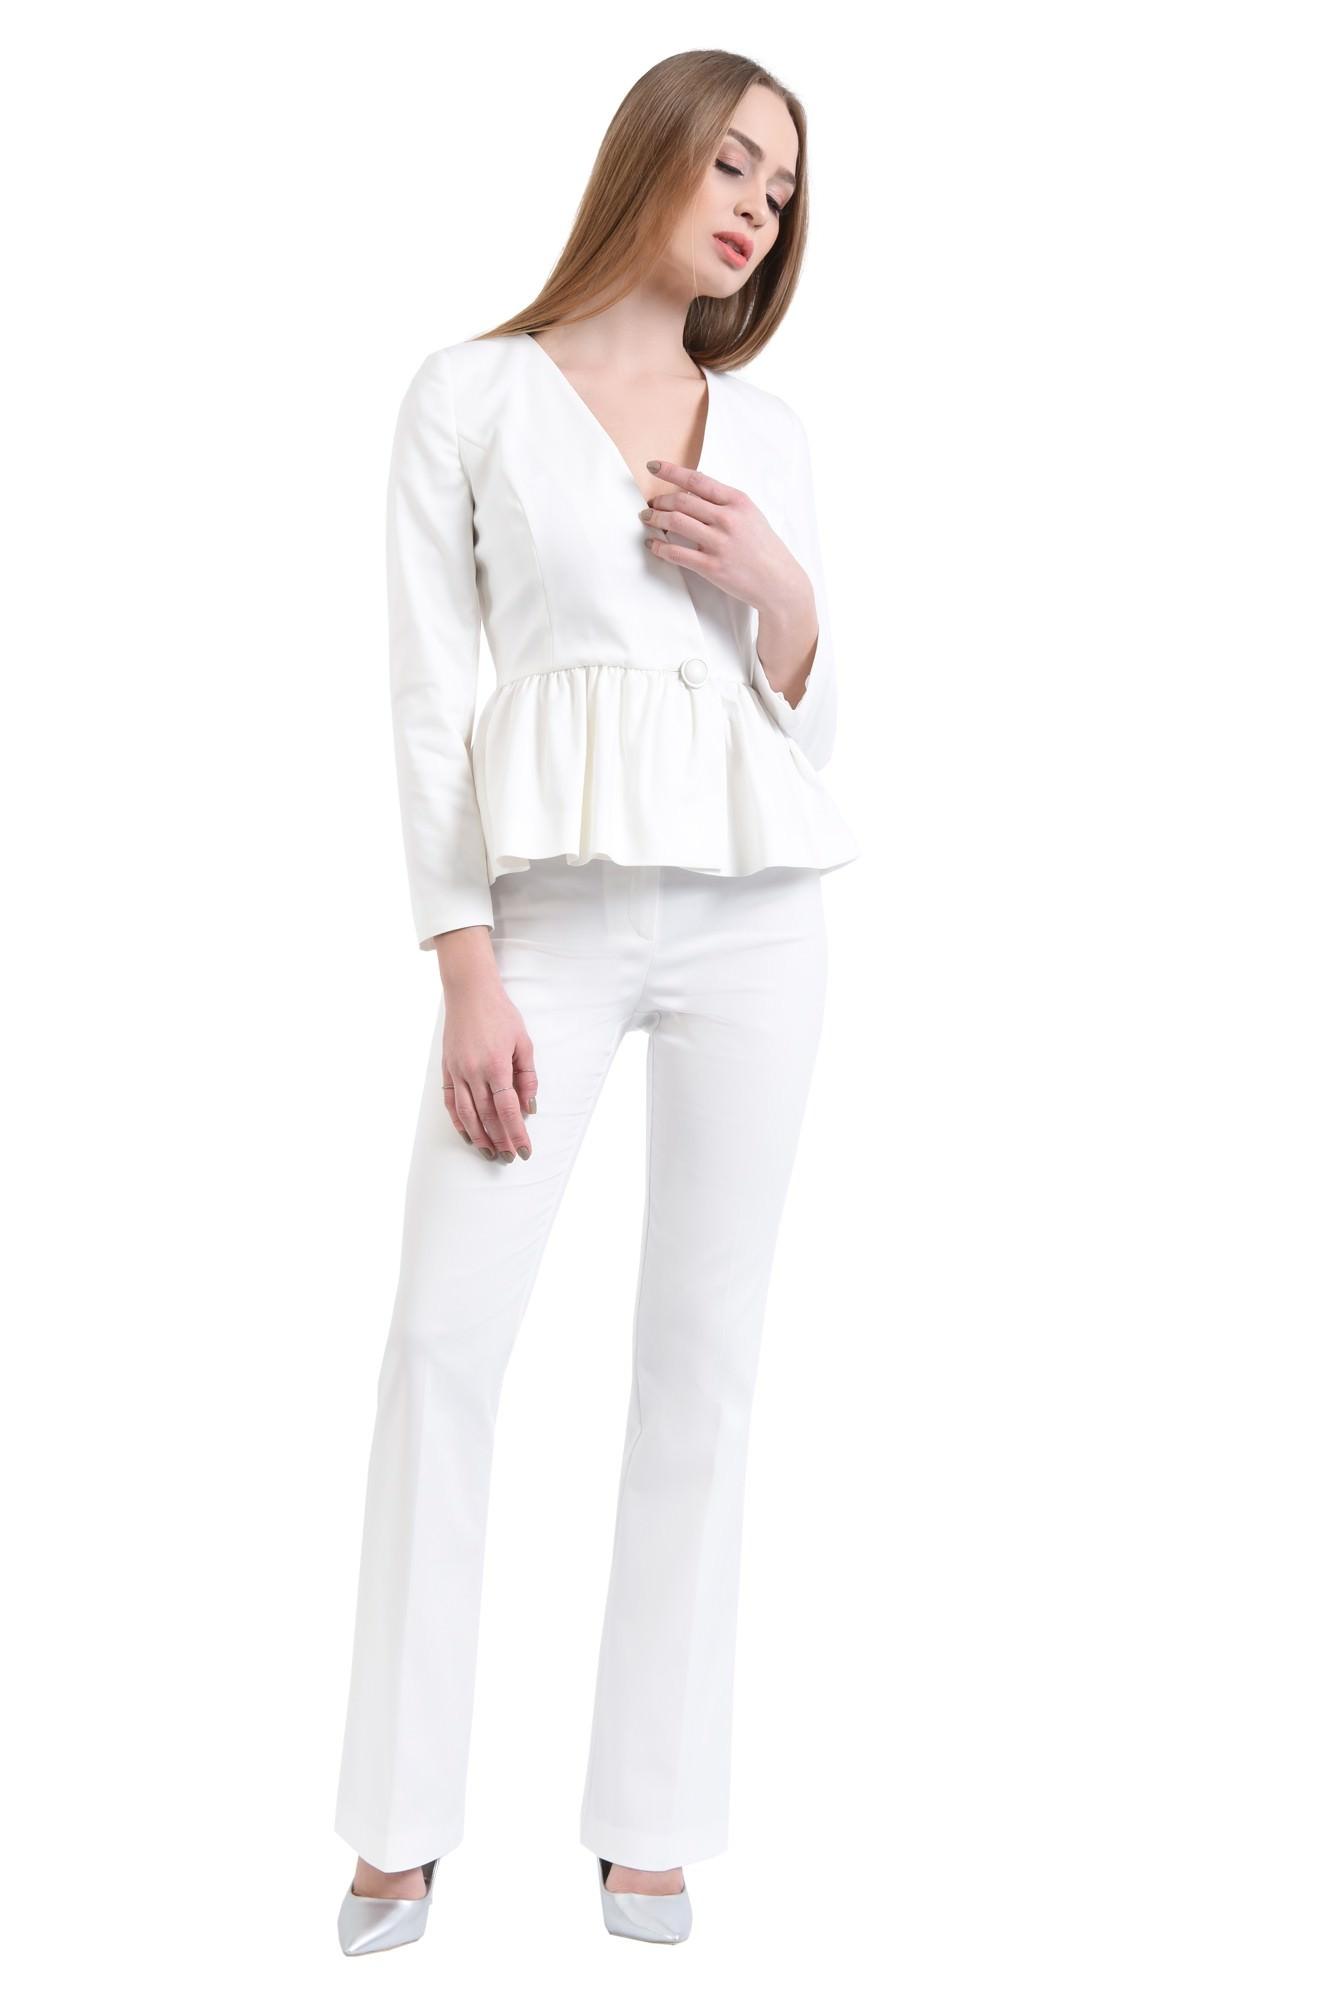 360 - Sacou casual alb, inchidere cu nasture decorativ